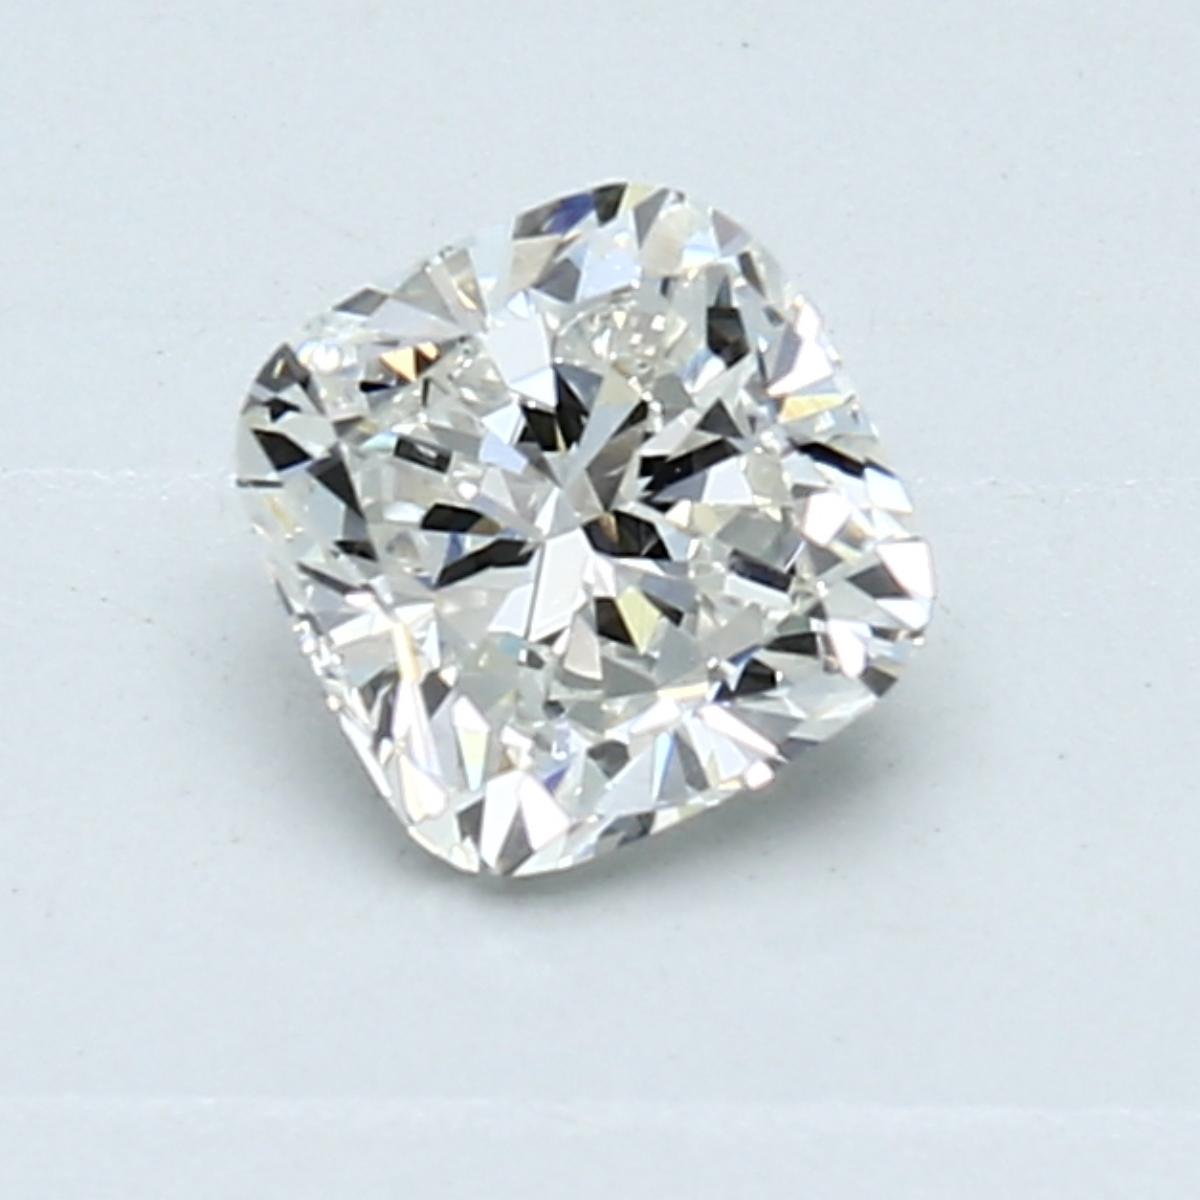 0.72-Carat Natural Ideally Cut Cushion Diamond